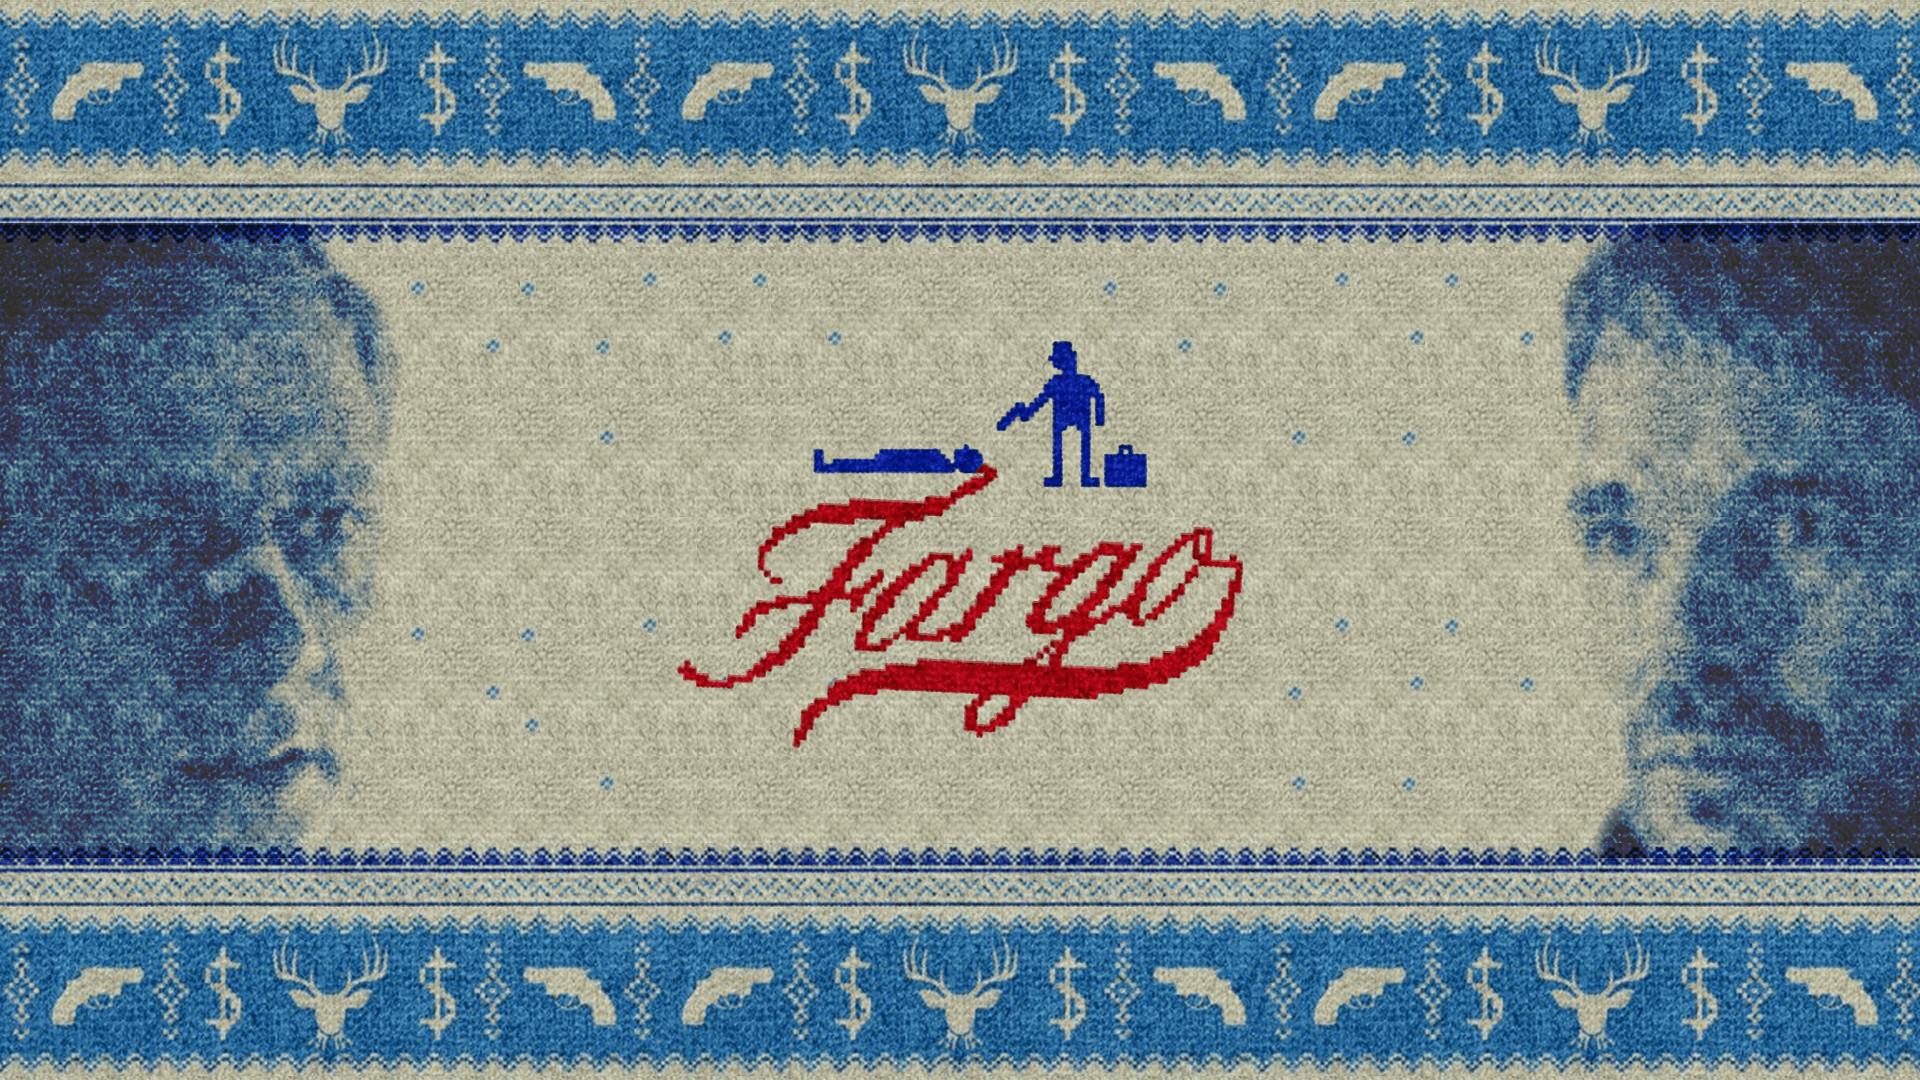 fargo tv show wallpaper 65295